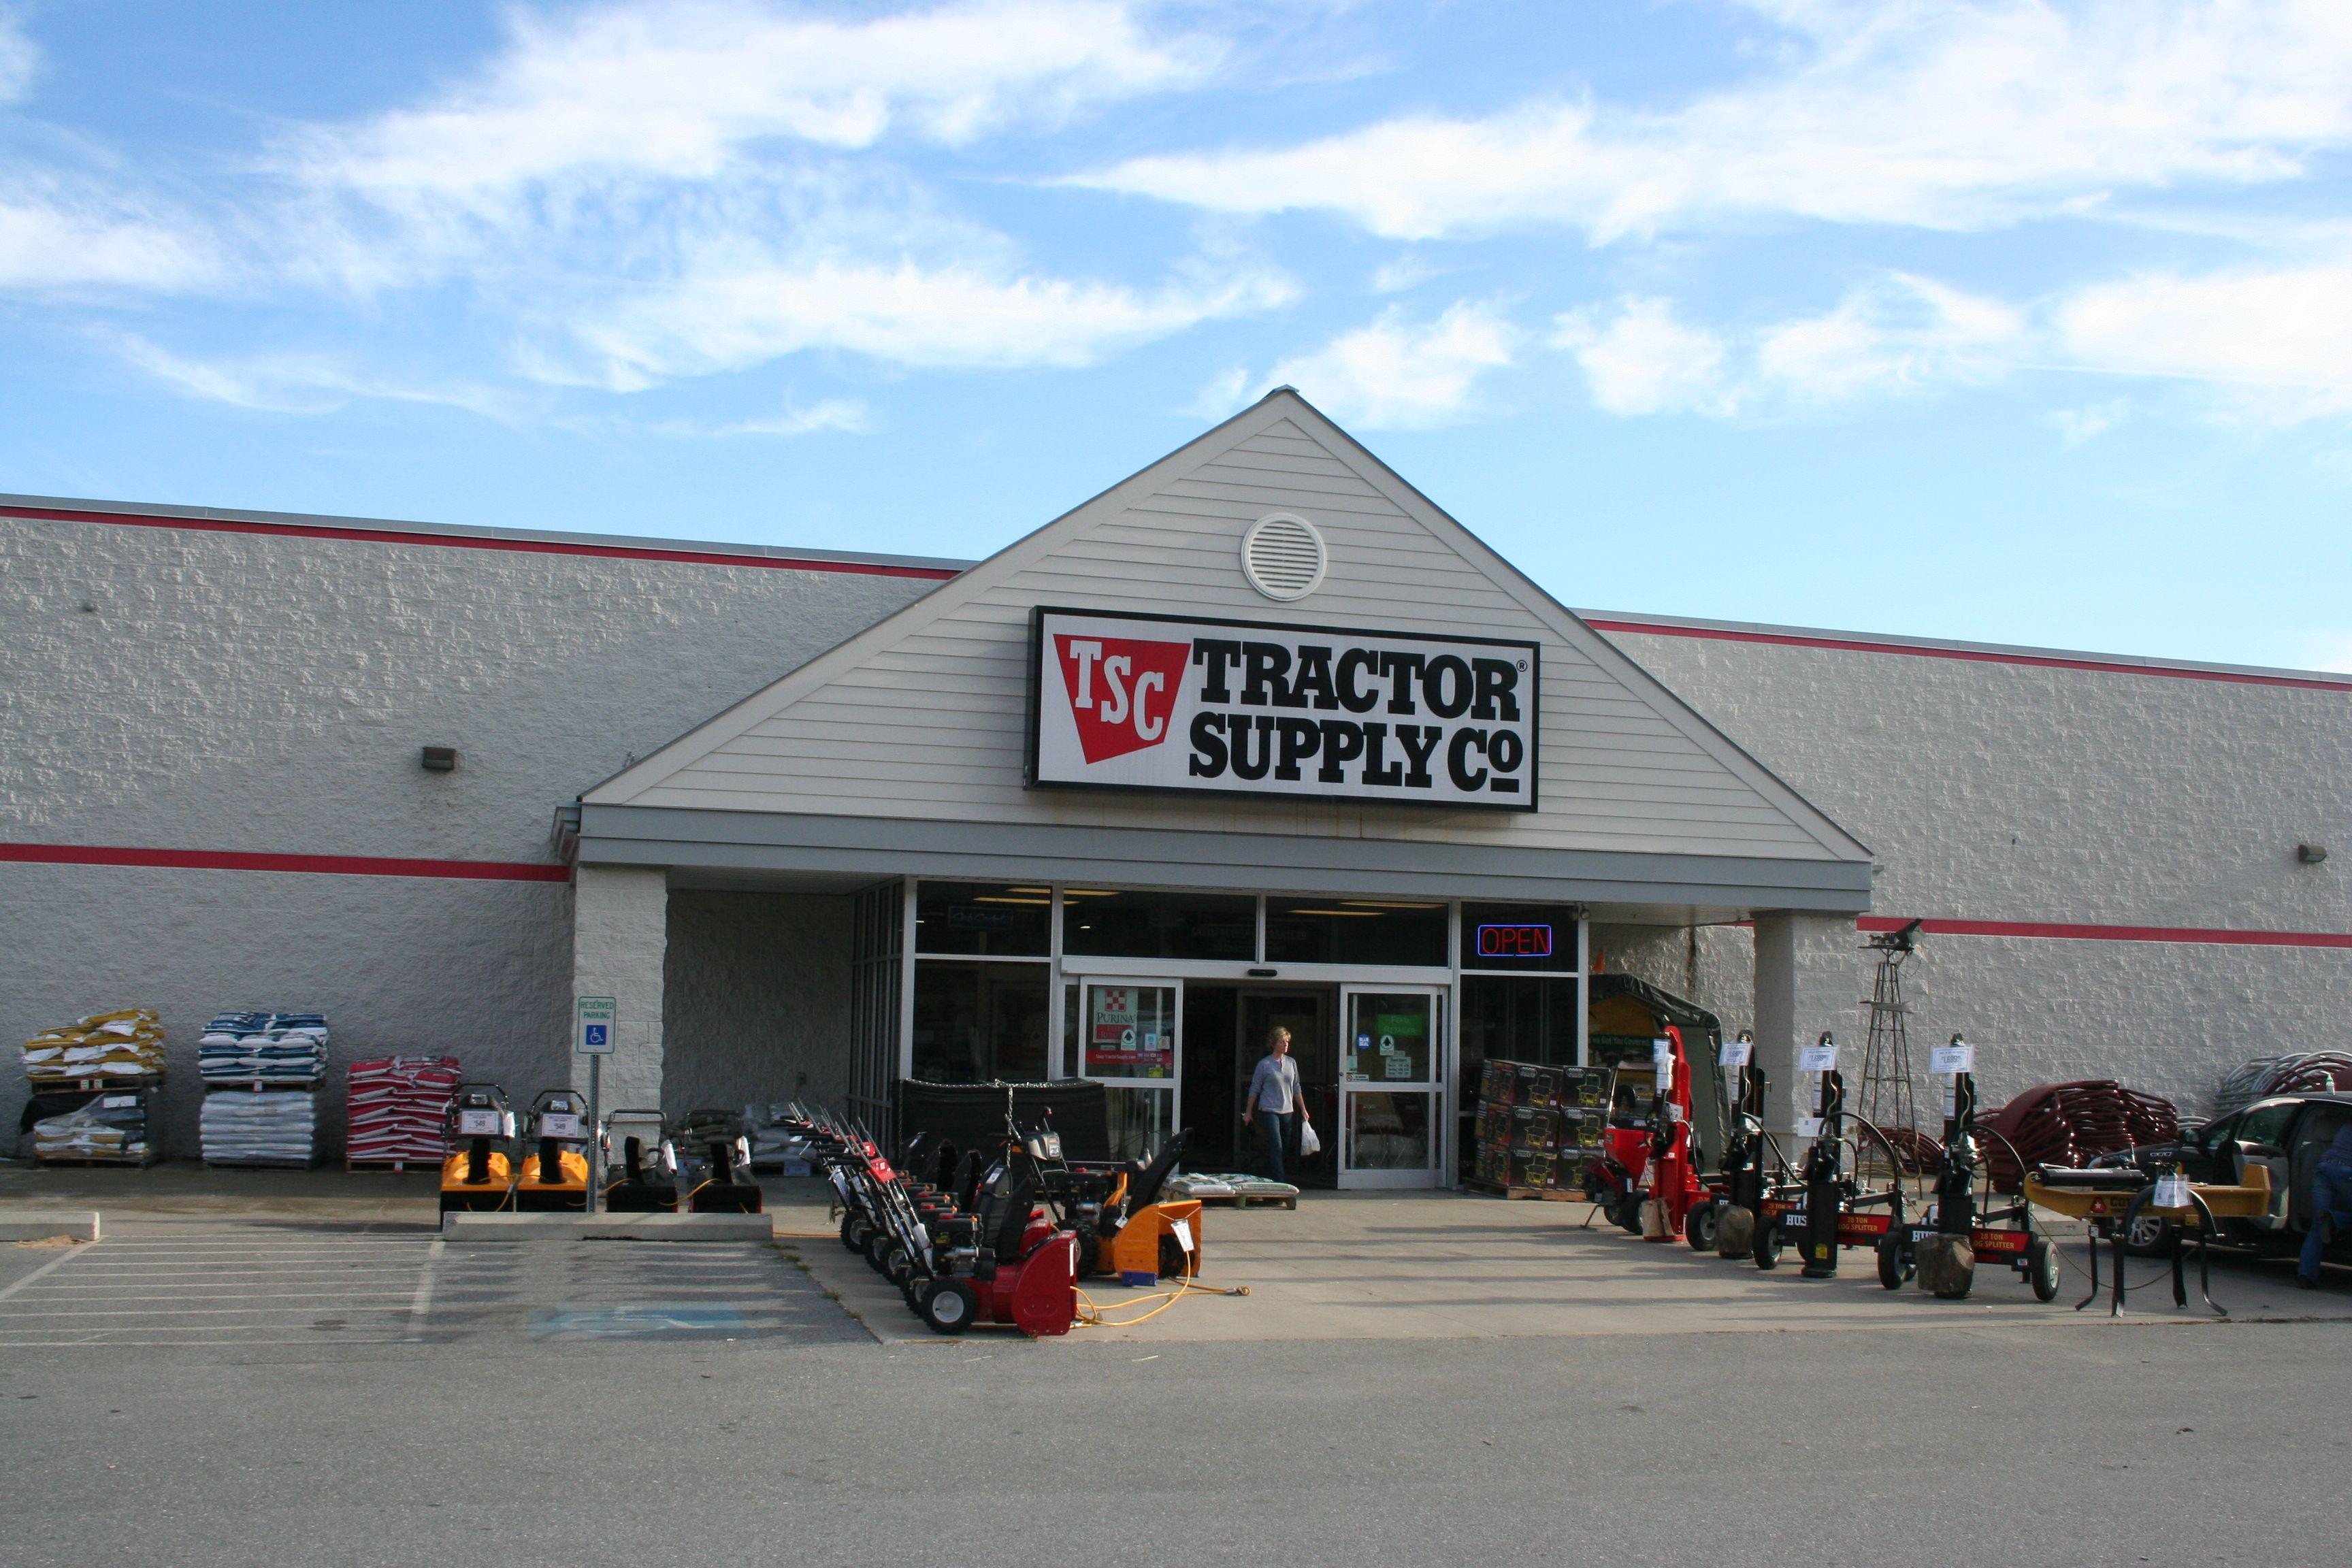 Home; Job Search; Job Search Results; Job Description; © Tractor Supply Co.